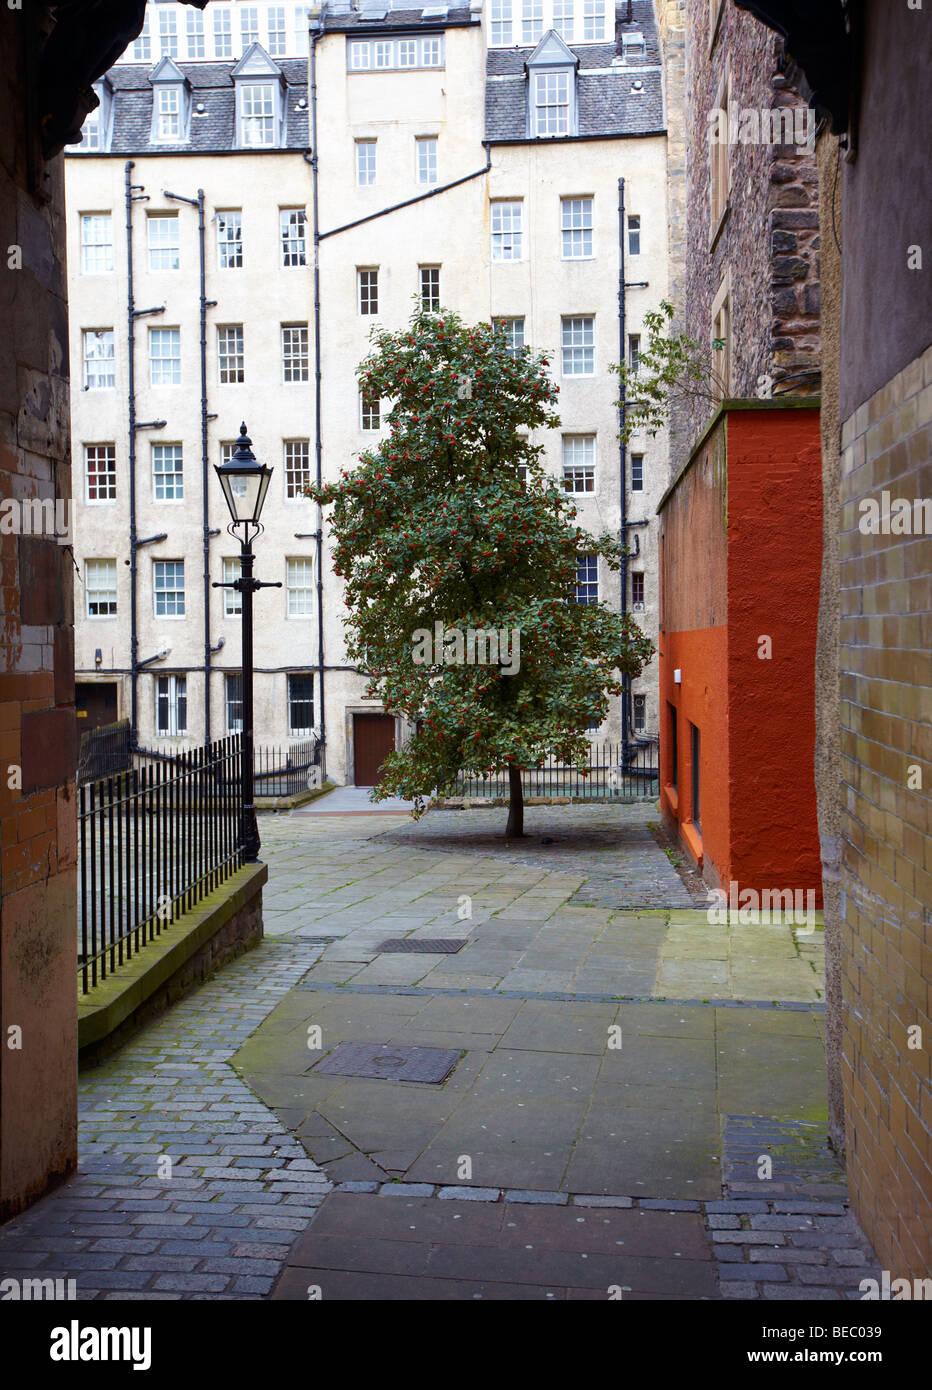 A Traditional Tenement Square Edinburgh Scotland UK - Stock Image